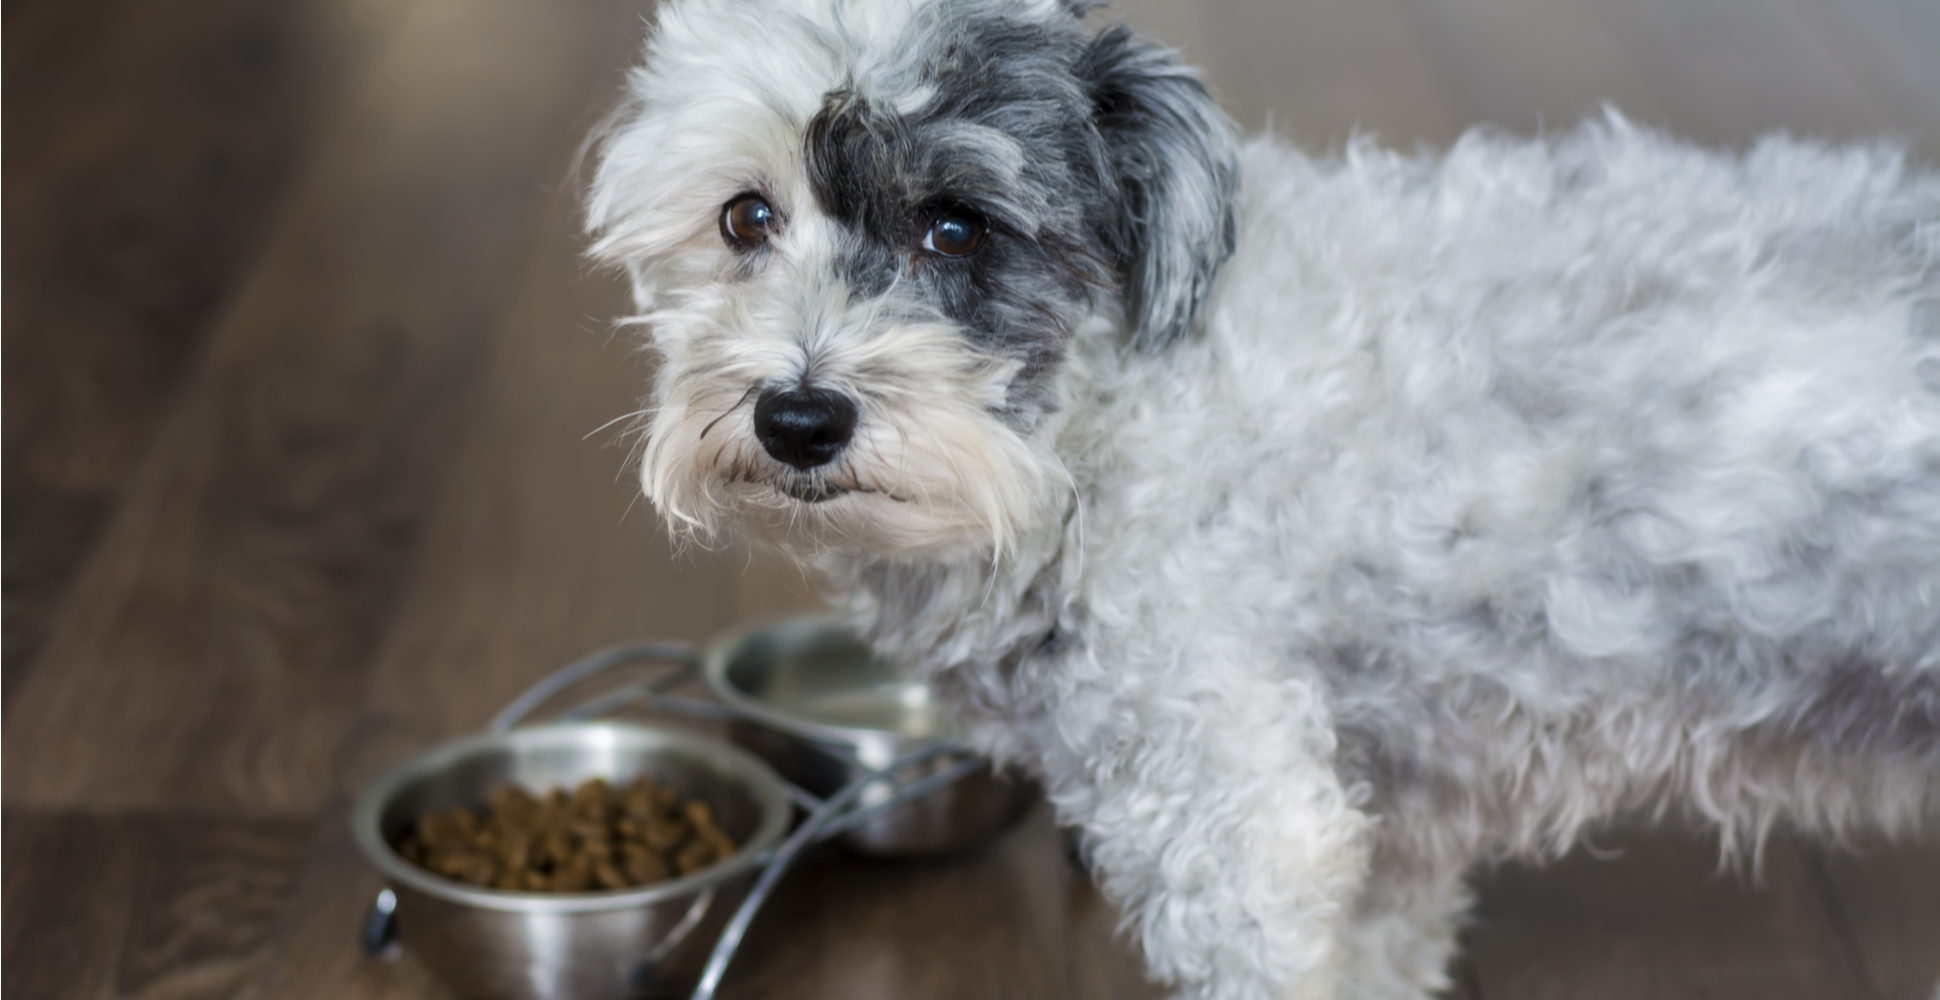 havanese-dog-breed-guide-feeding